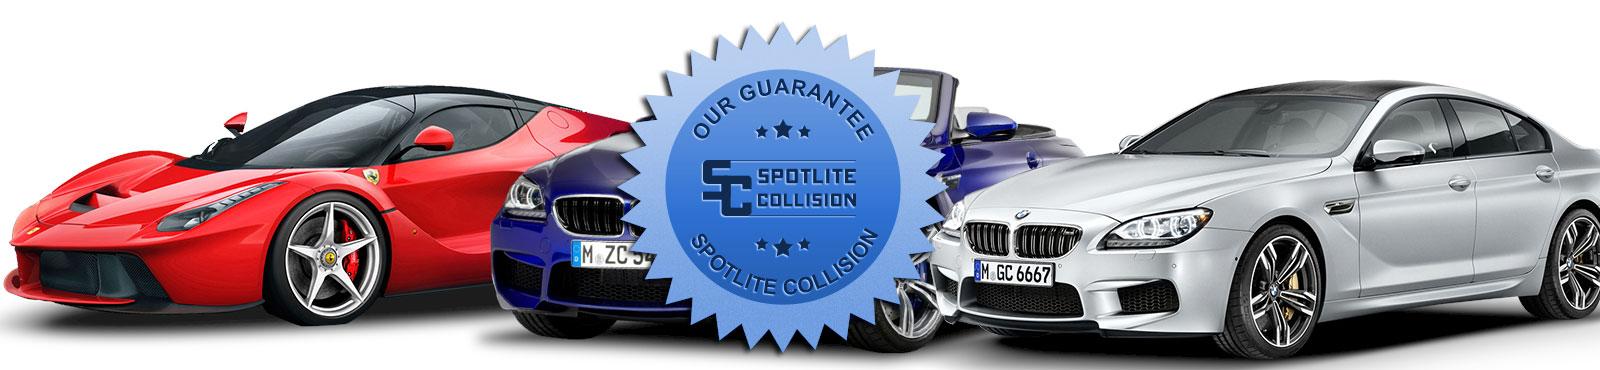 guarantee-header